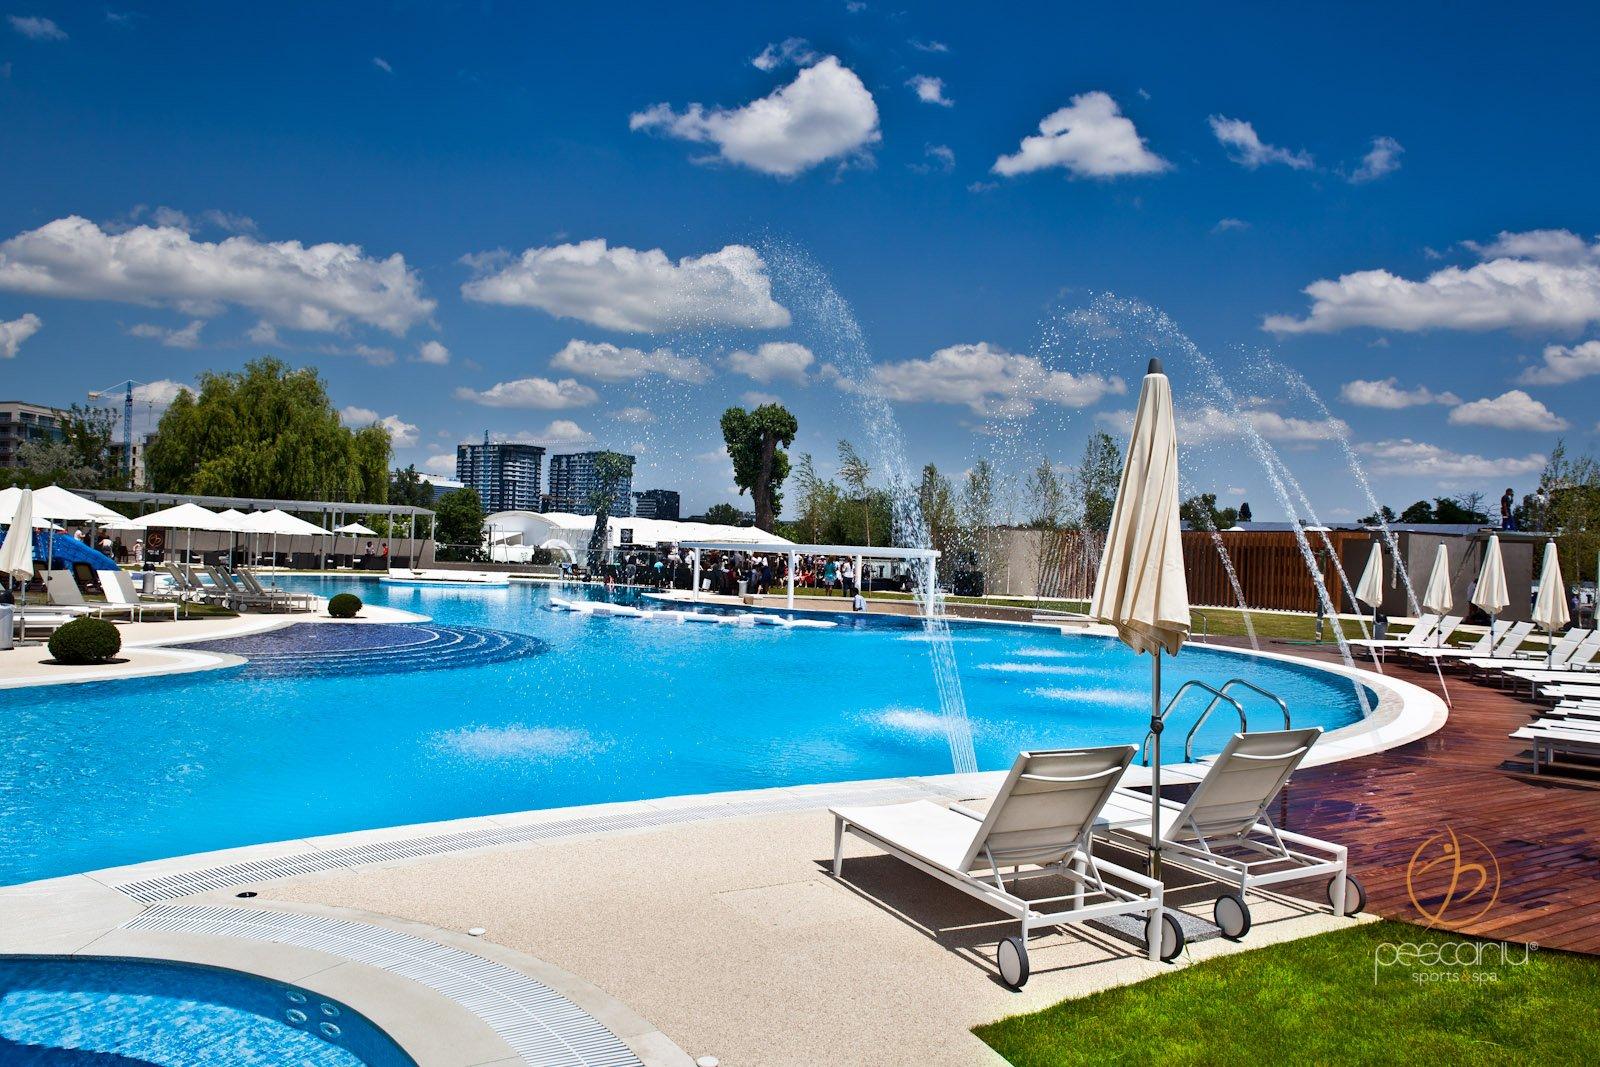 5 piscine cool in bucuresti blogul for Piscine 08